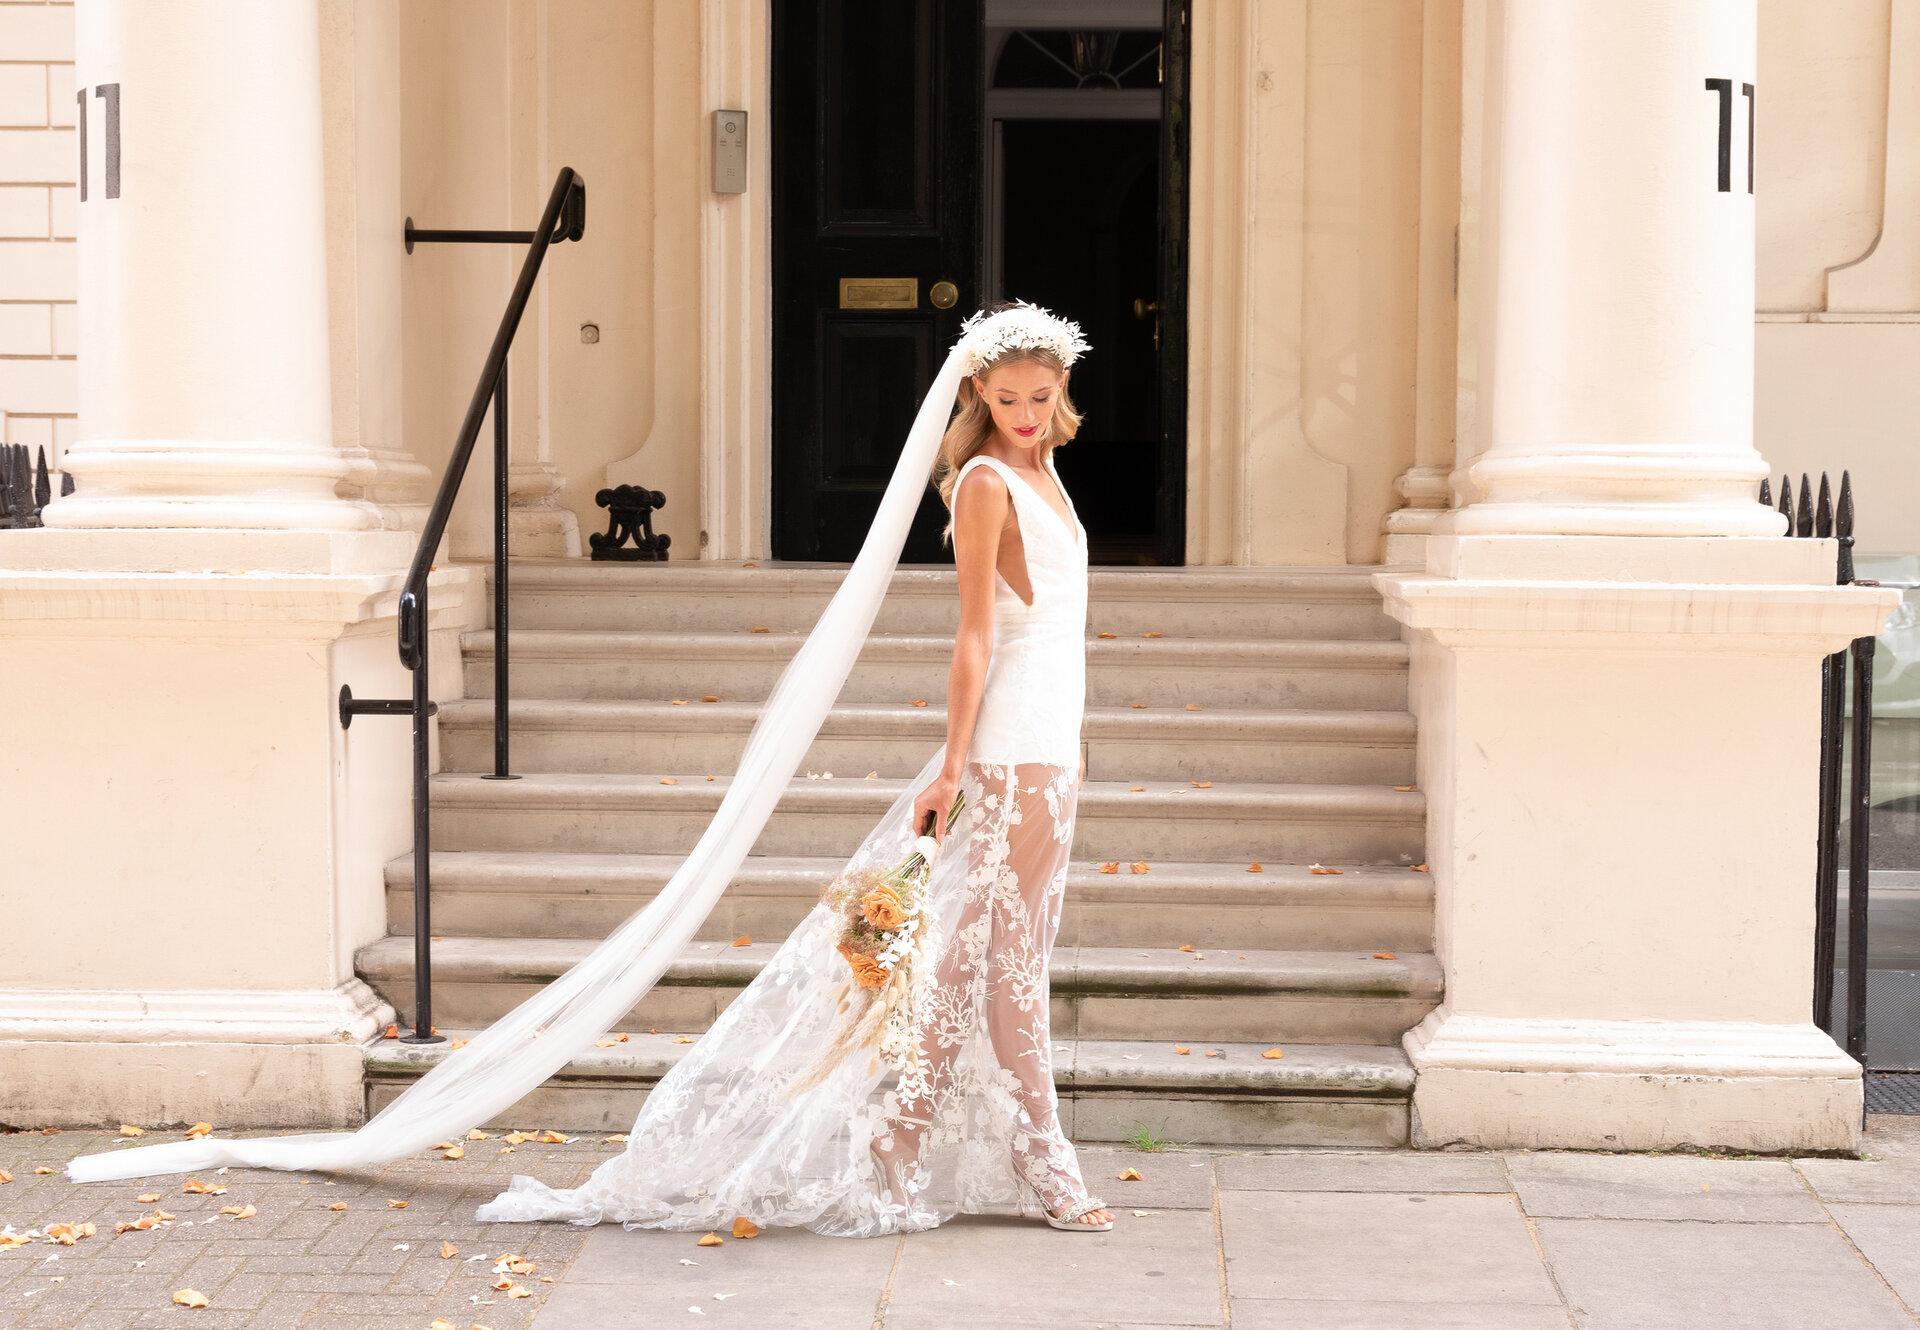 Handmade Wedding Dresses Uk Blog Category,Wedding Guest Dresses Spring 2020